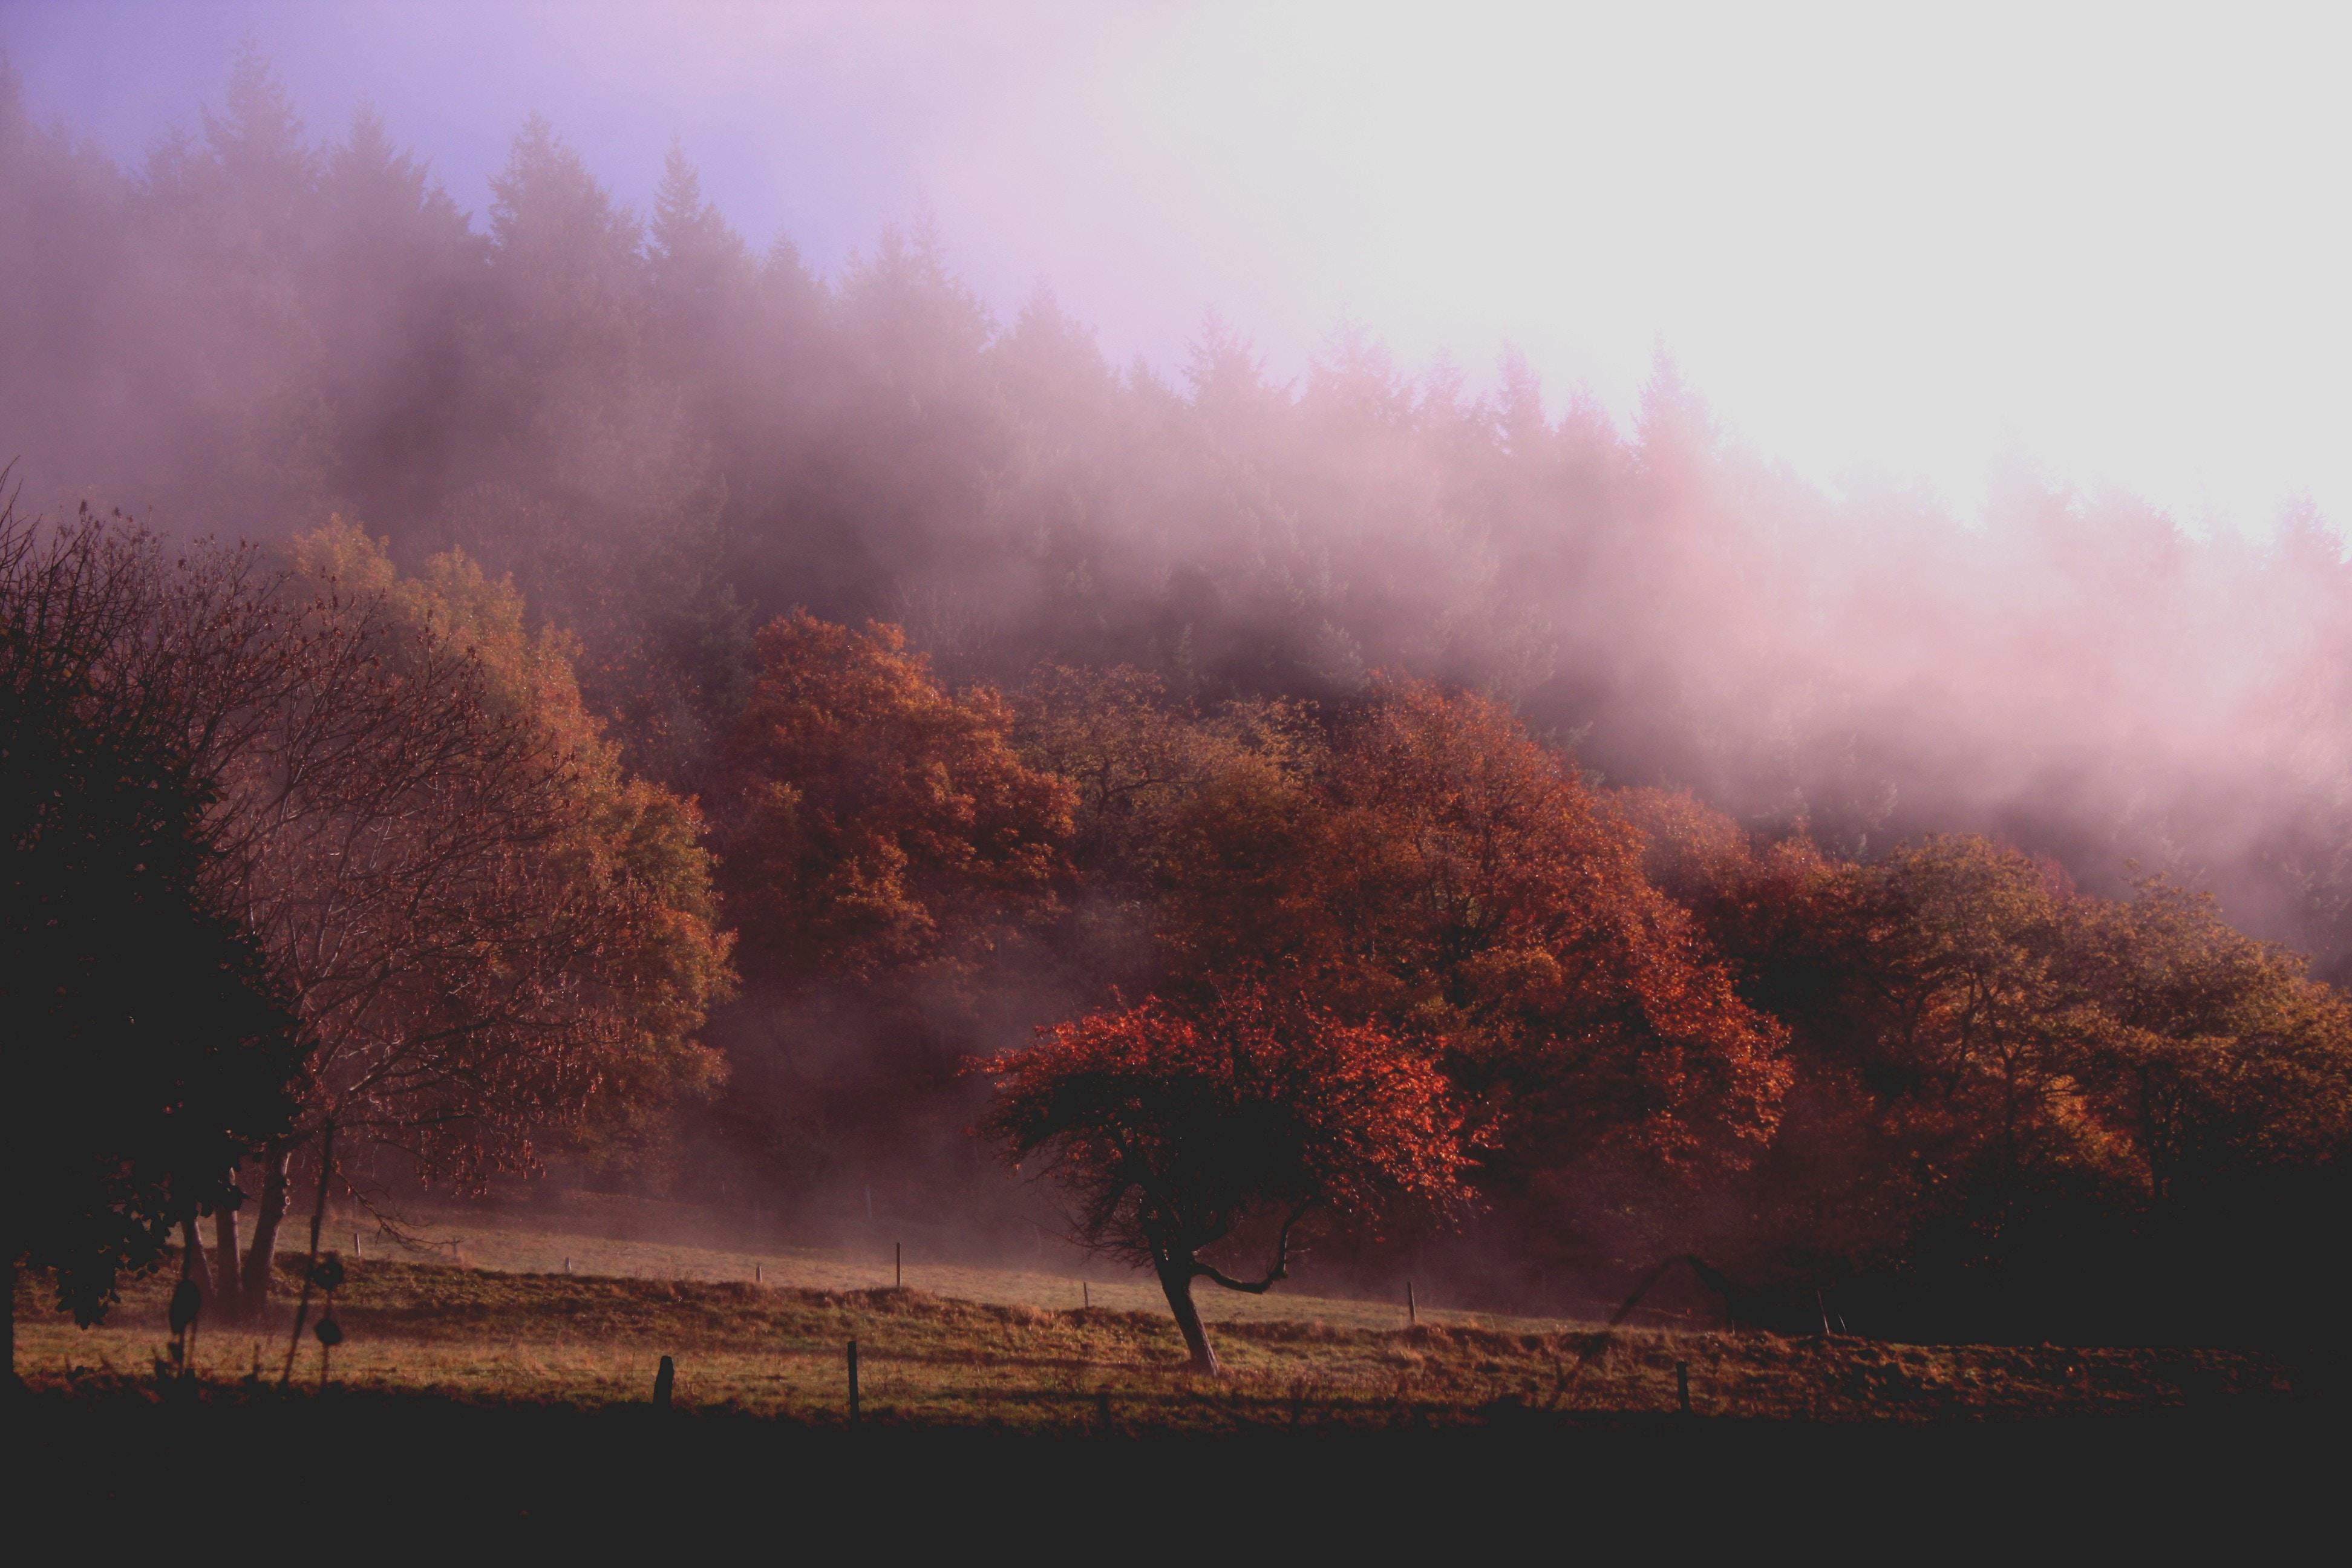 Fall Photos Misty Morning